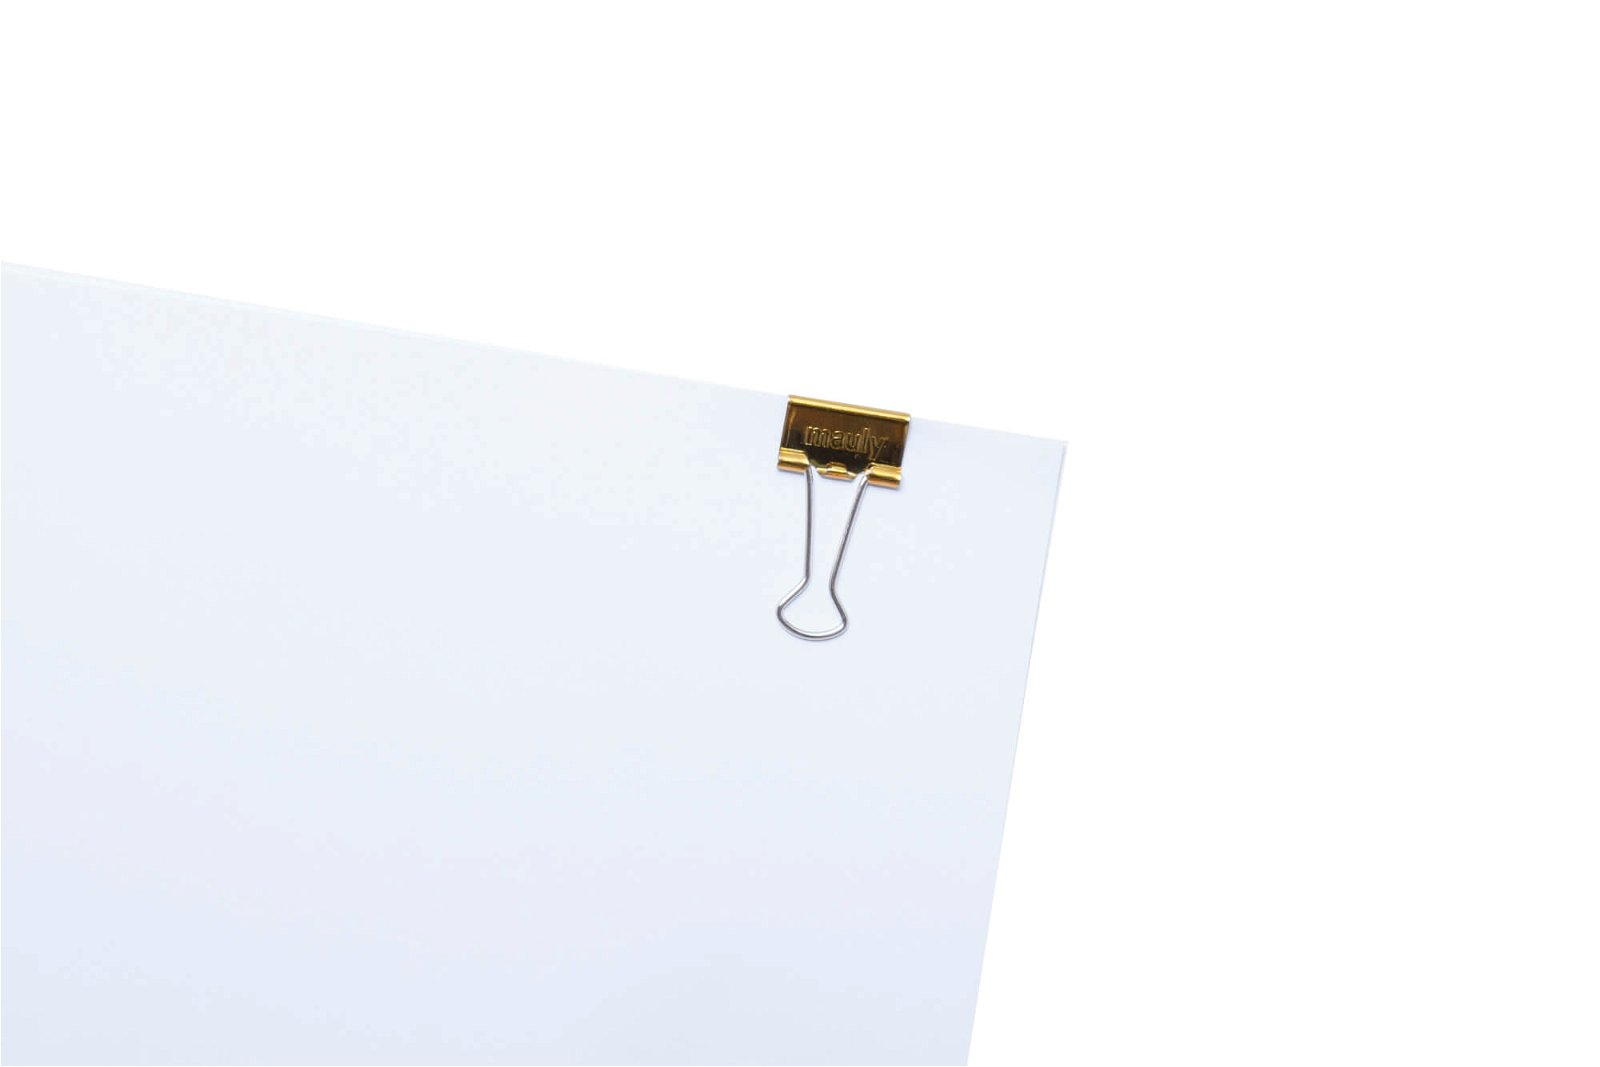 mauly 214, Breite 19 mm, 12 St./Ktn., gold